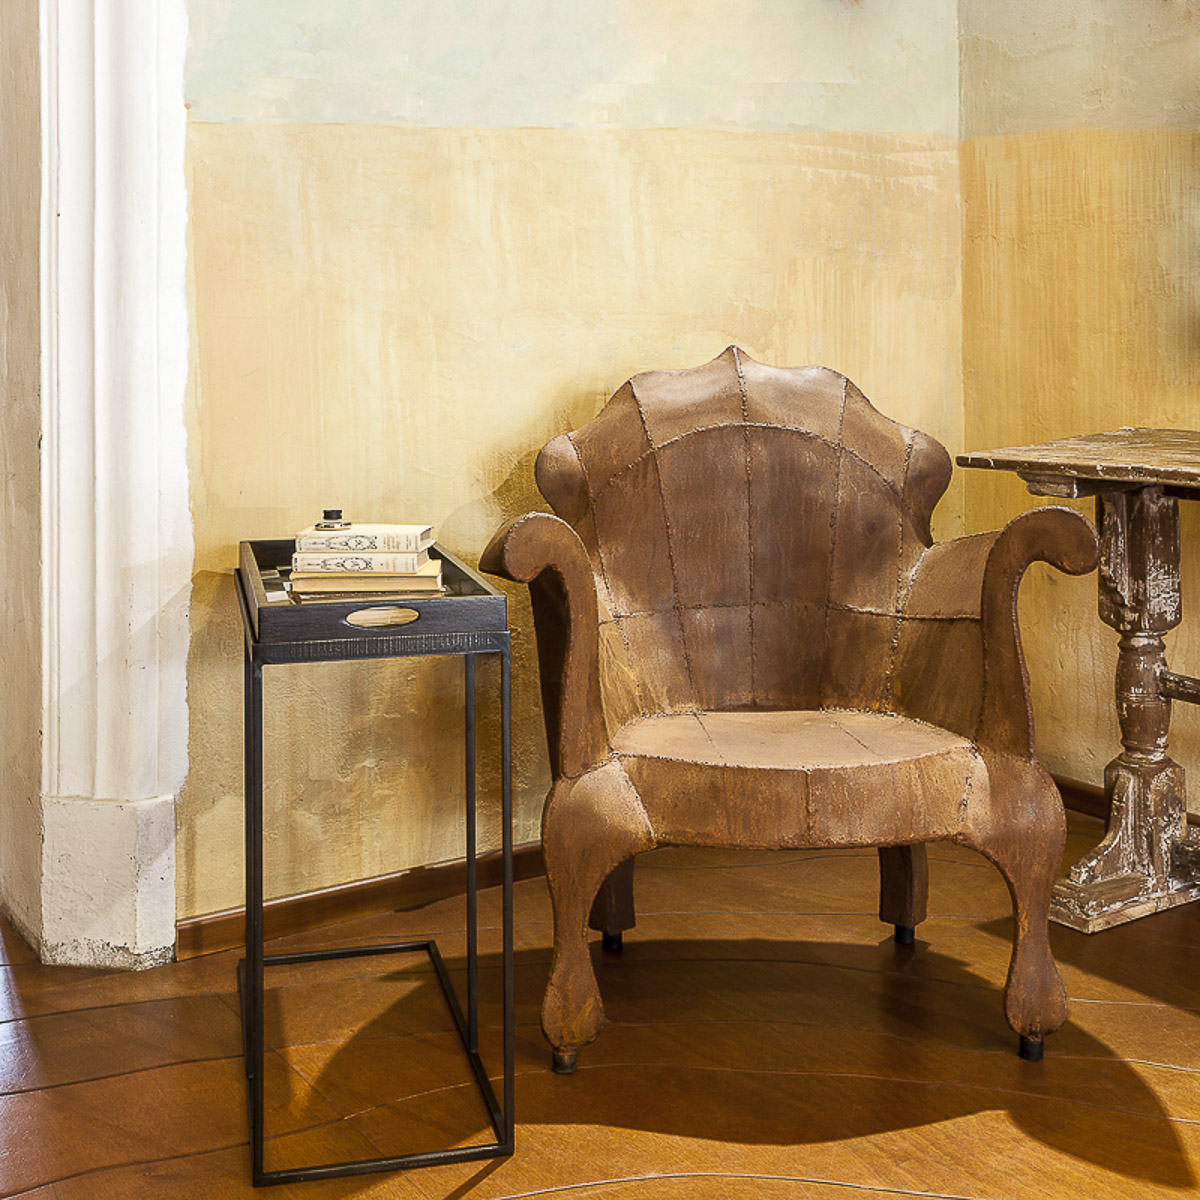 8-chiara-castelli-casa-store.jpg